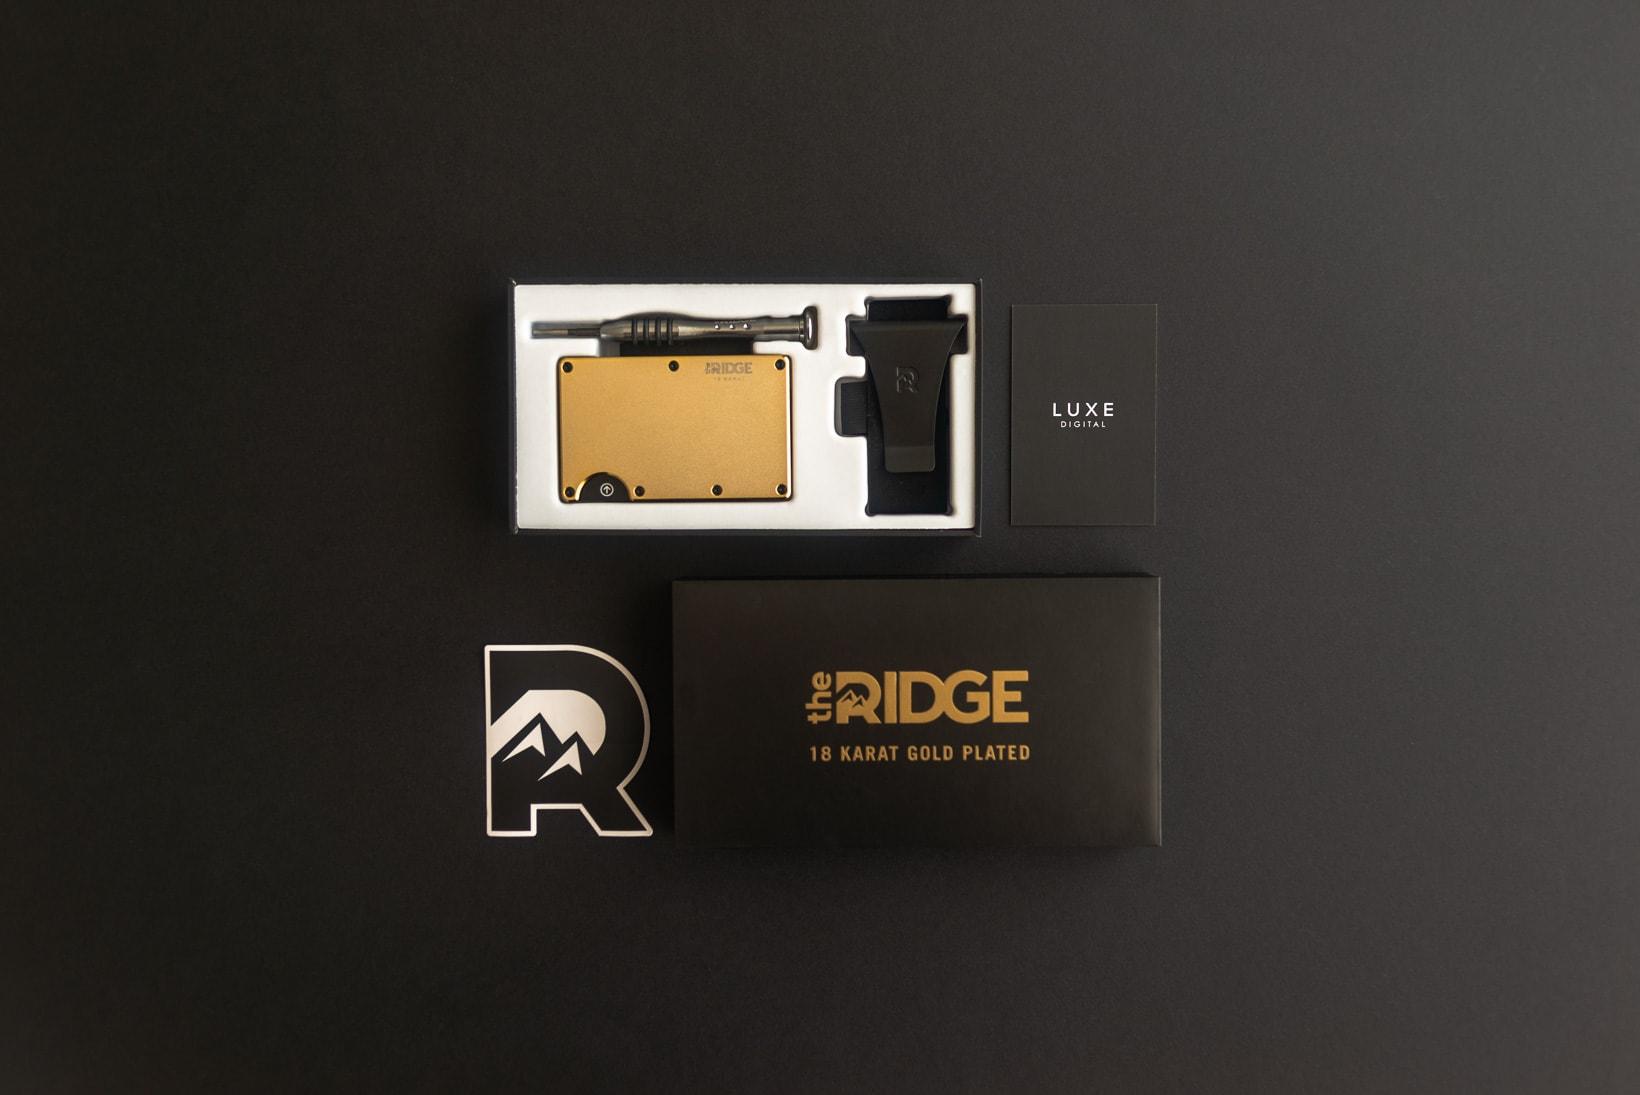 ridge wallet unboxing review - Luxe Digital